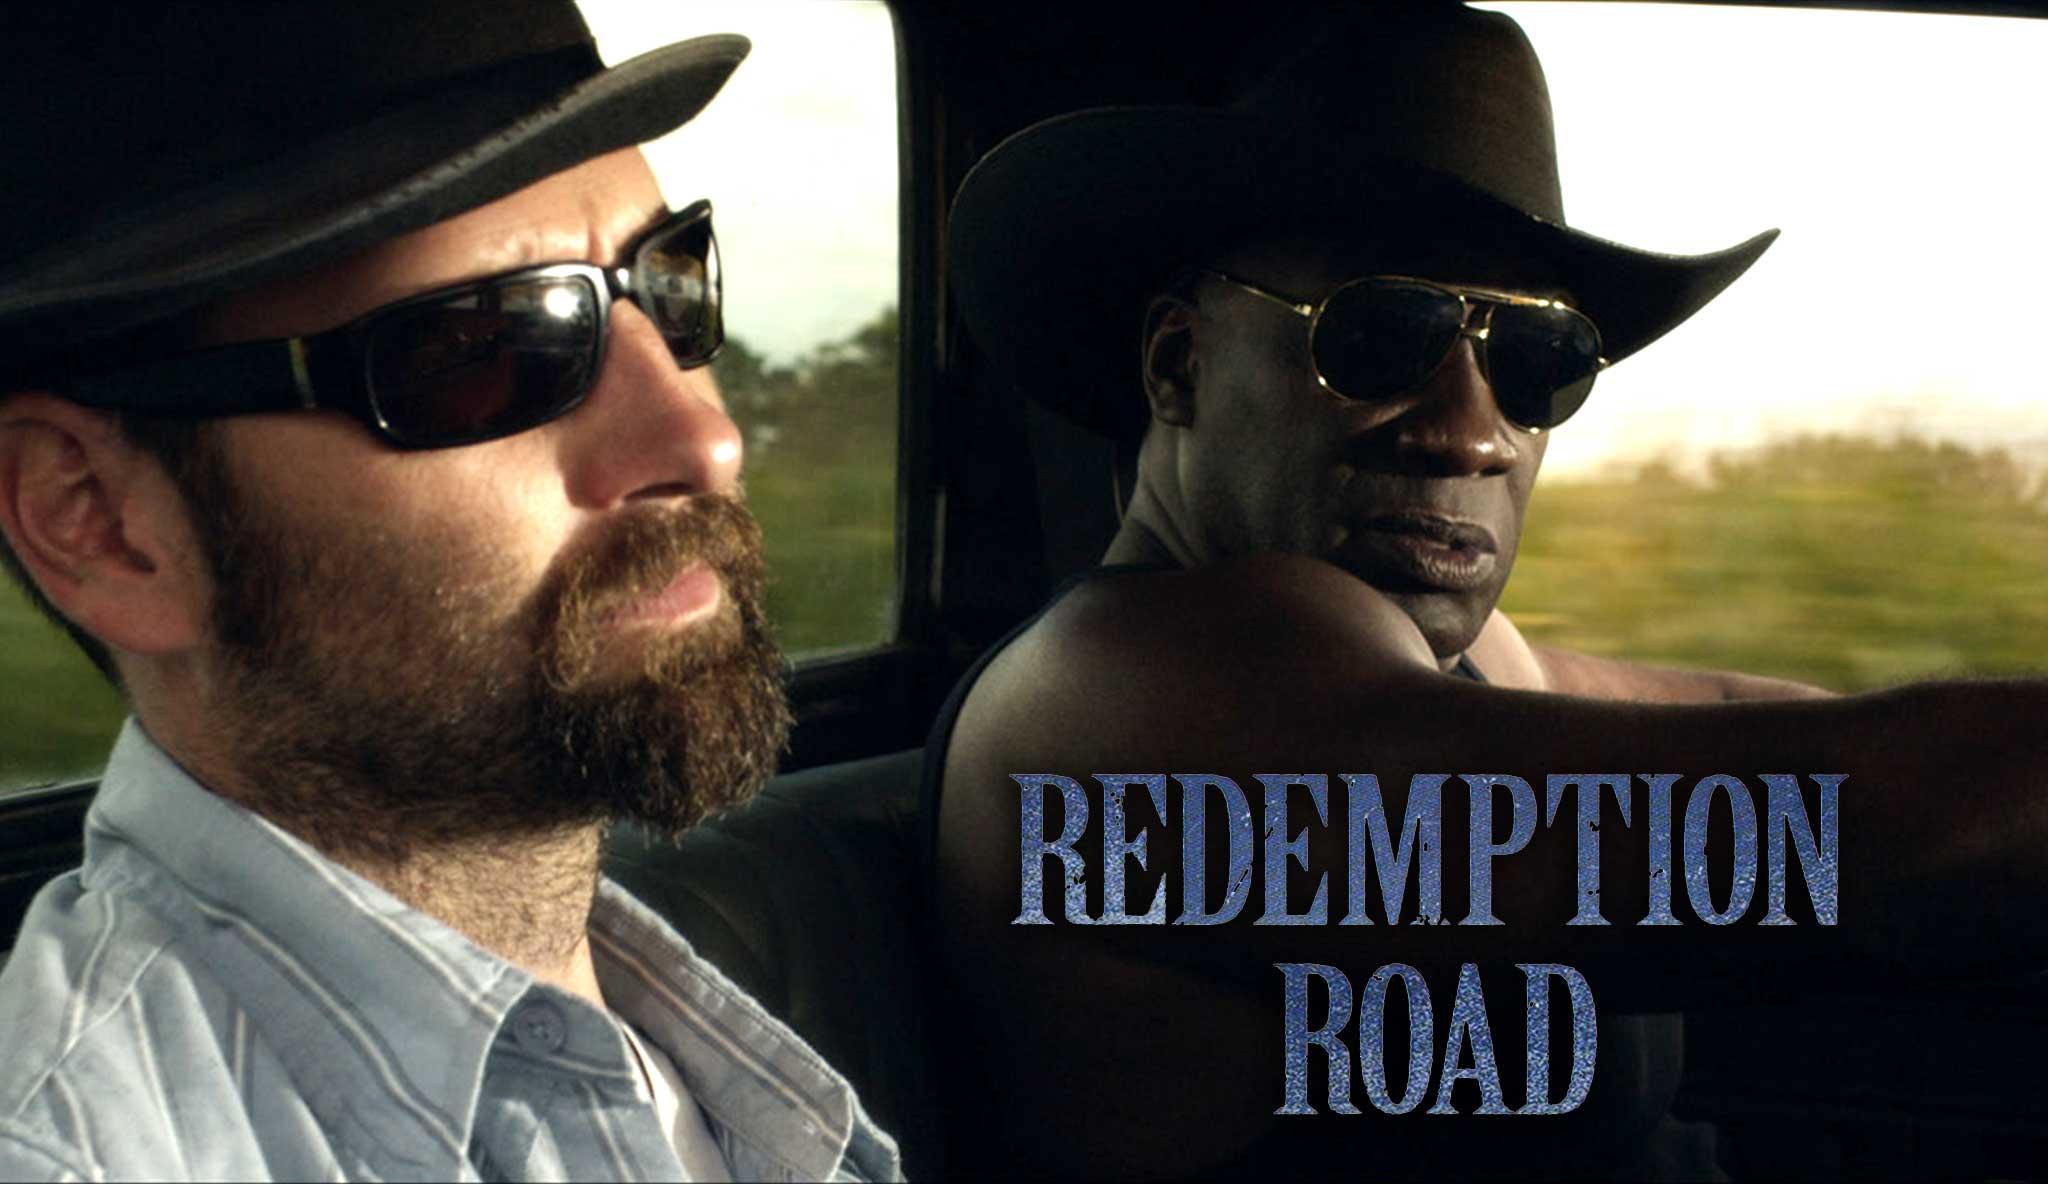 redemption-road-black-white-blues\header.jpg